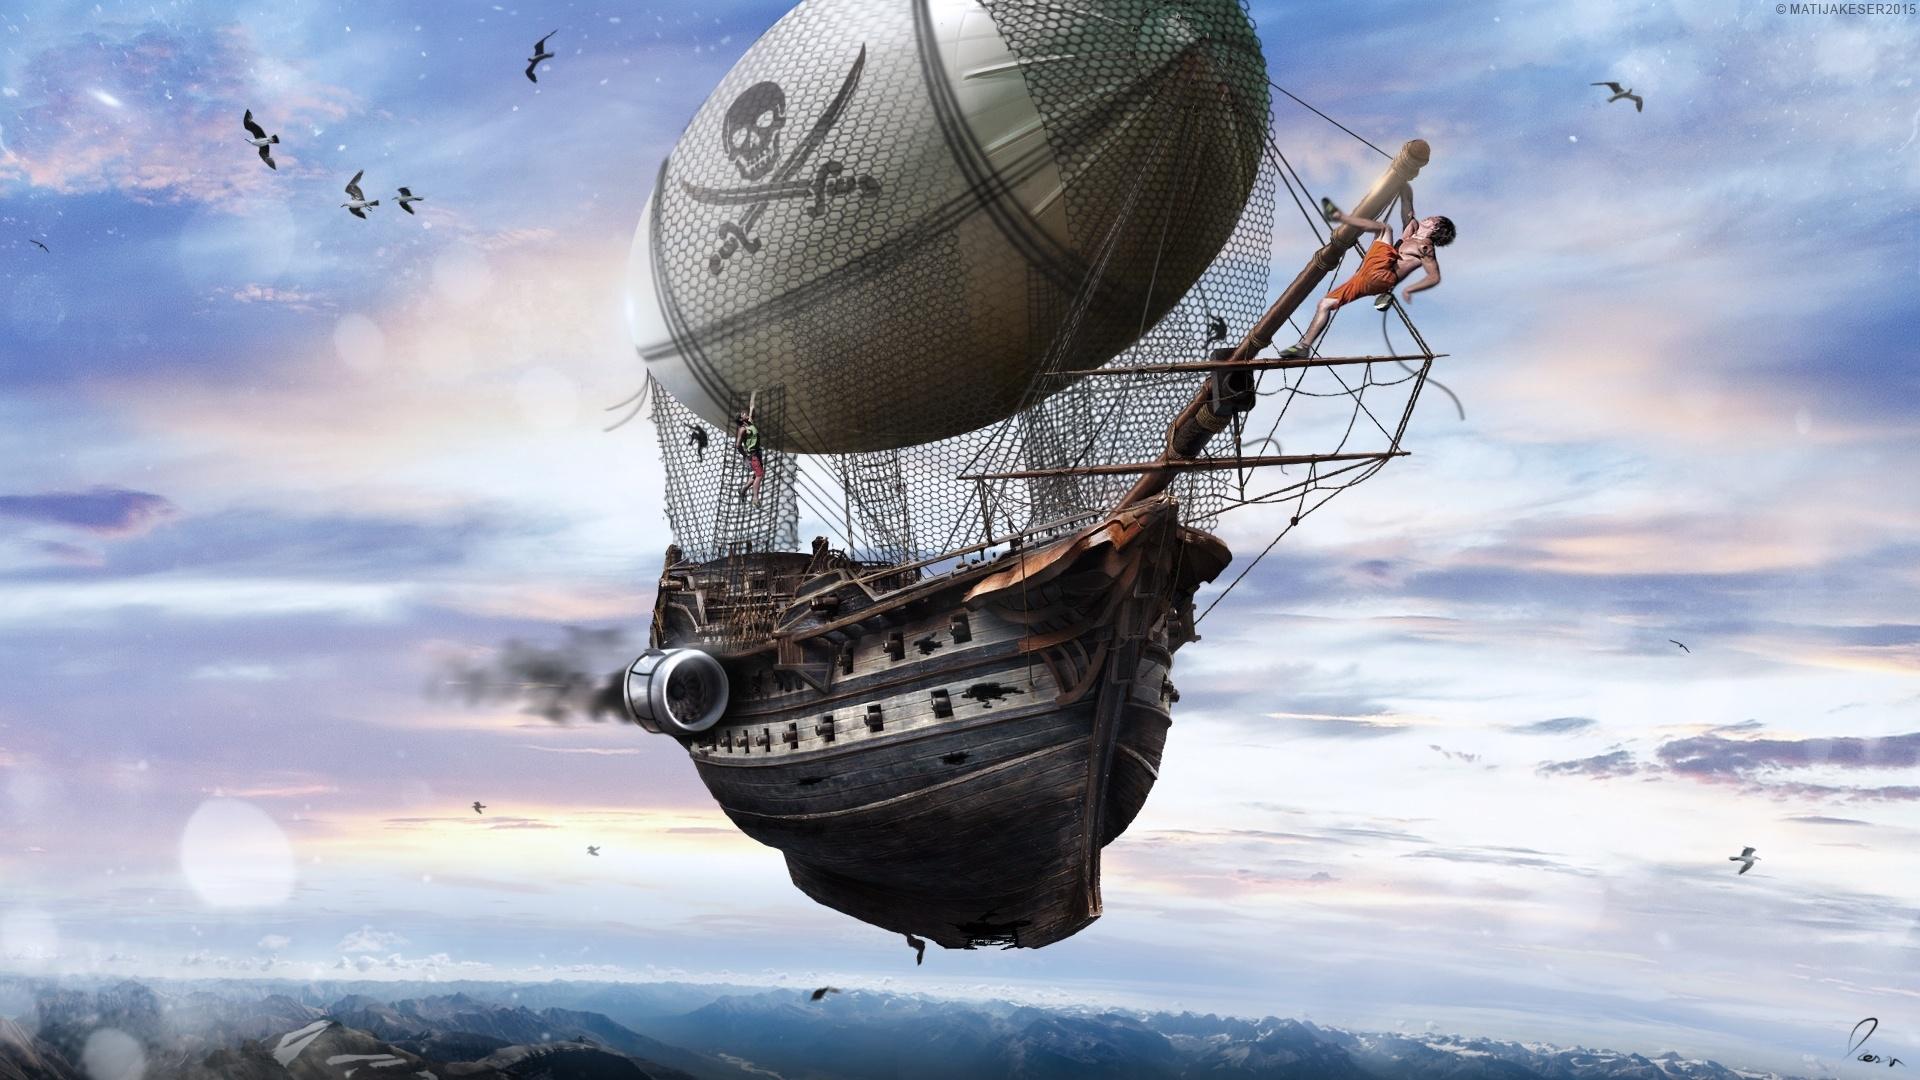 Airship Art Background